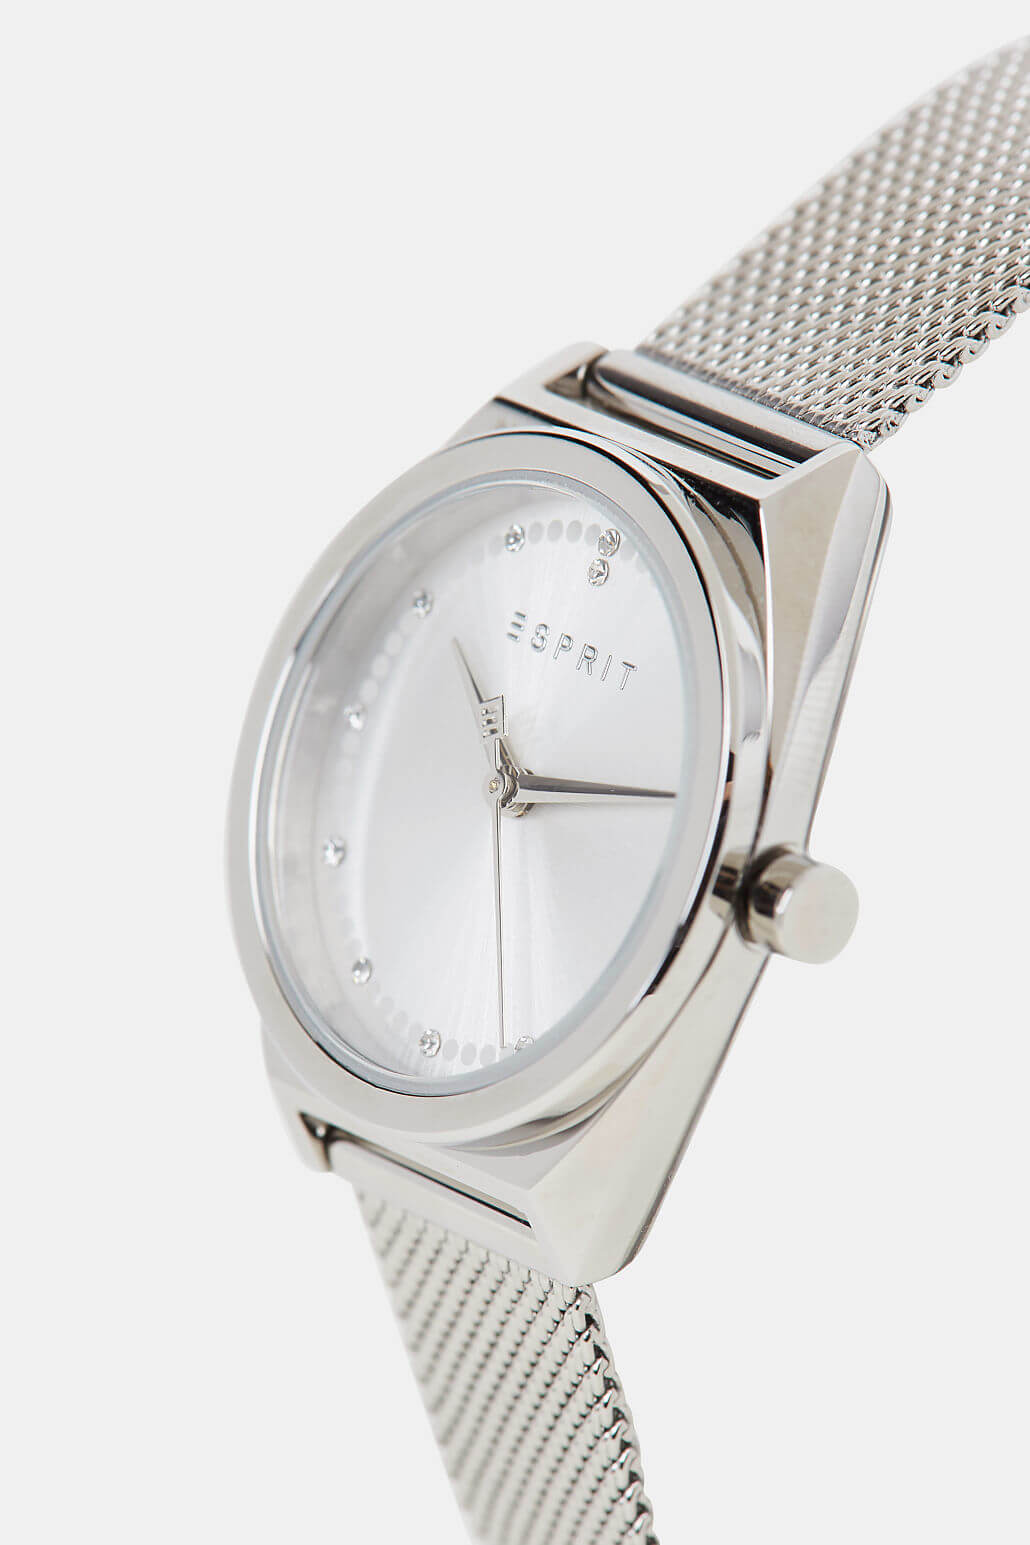 Esprit Slice Dot Silver Mesh SET ES1L100M0055 Doprava ZDARMA ... b785390f711